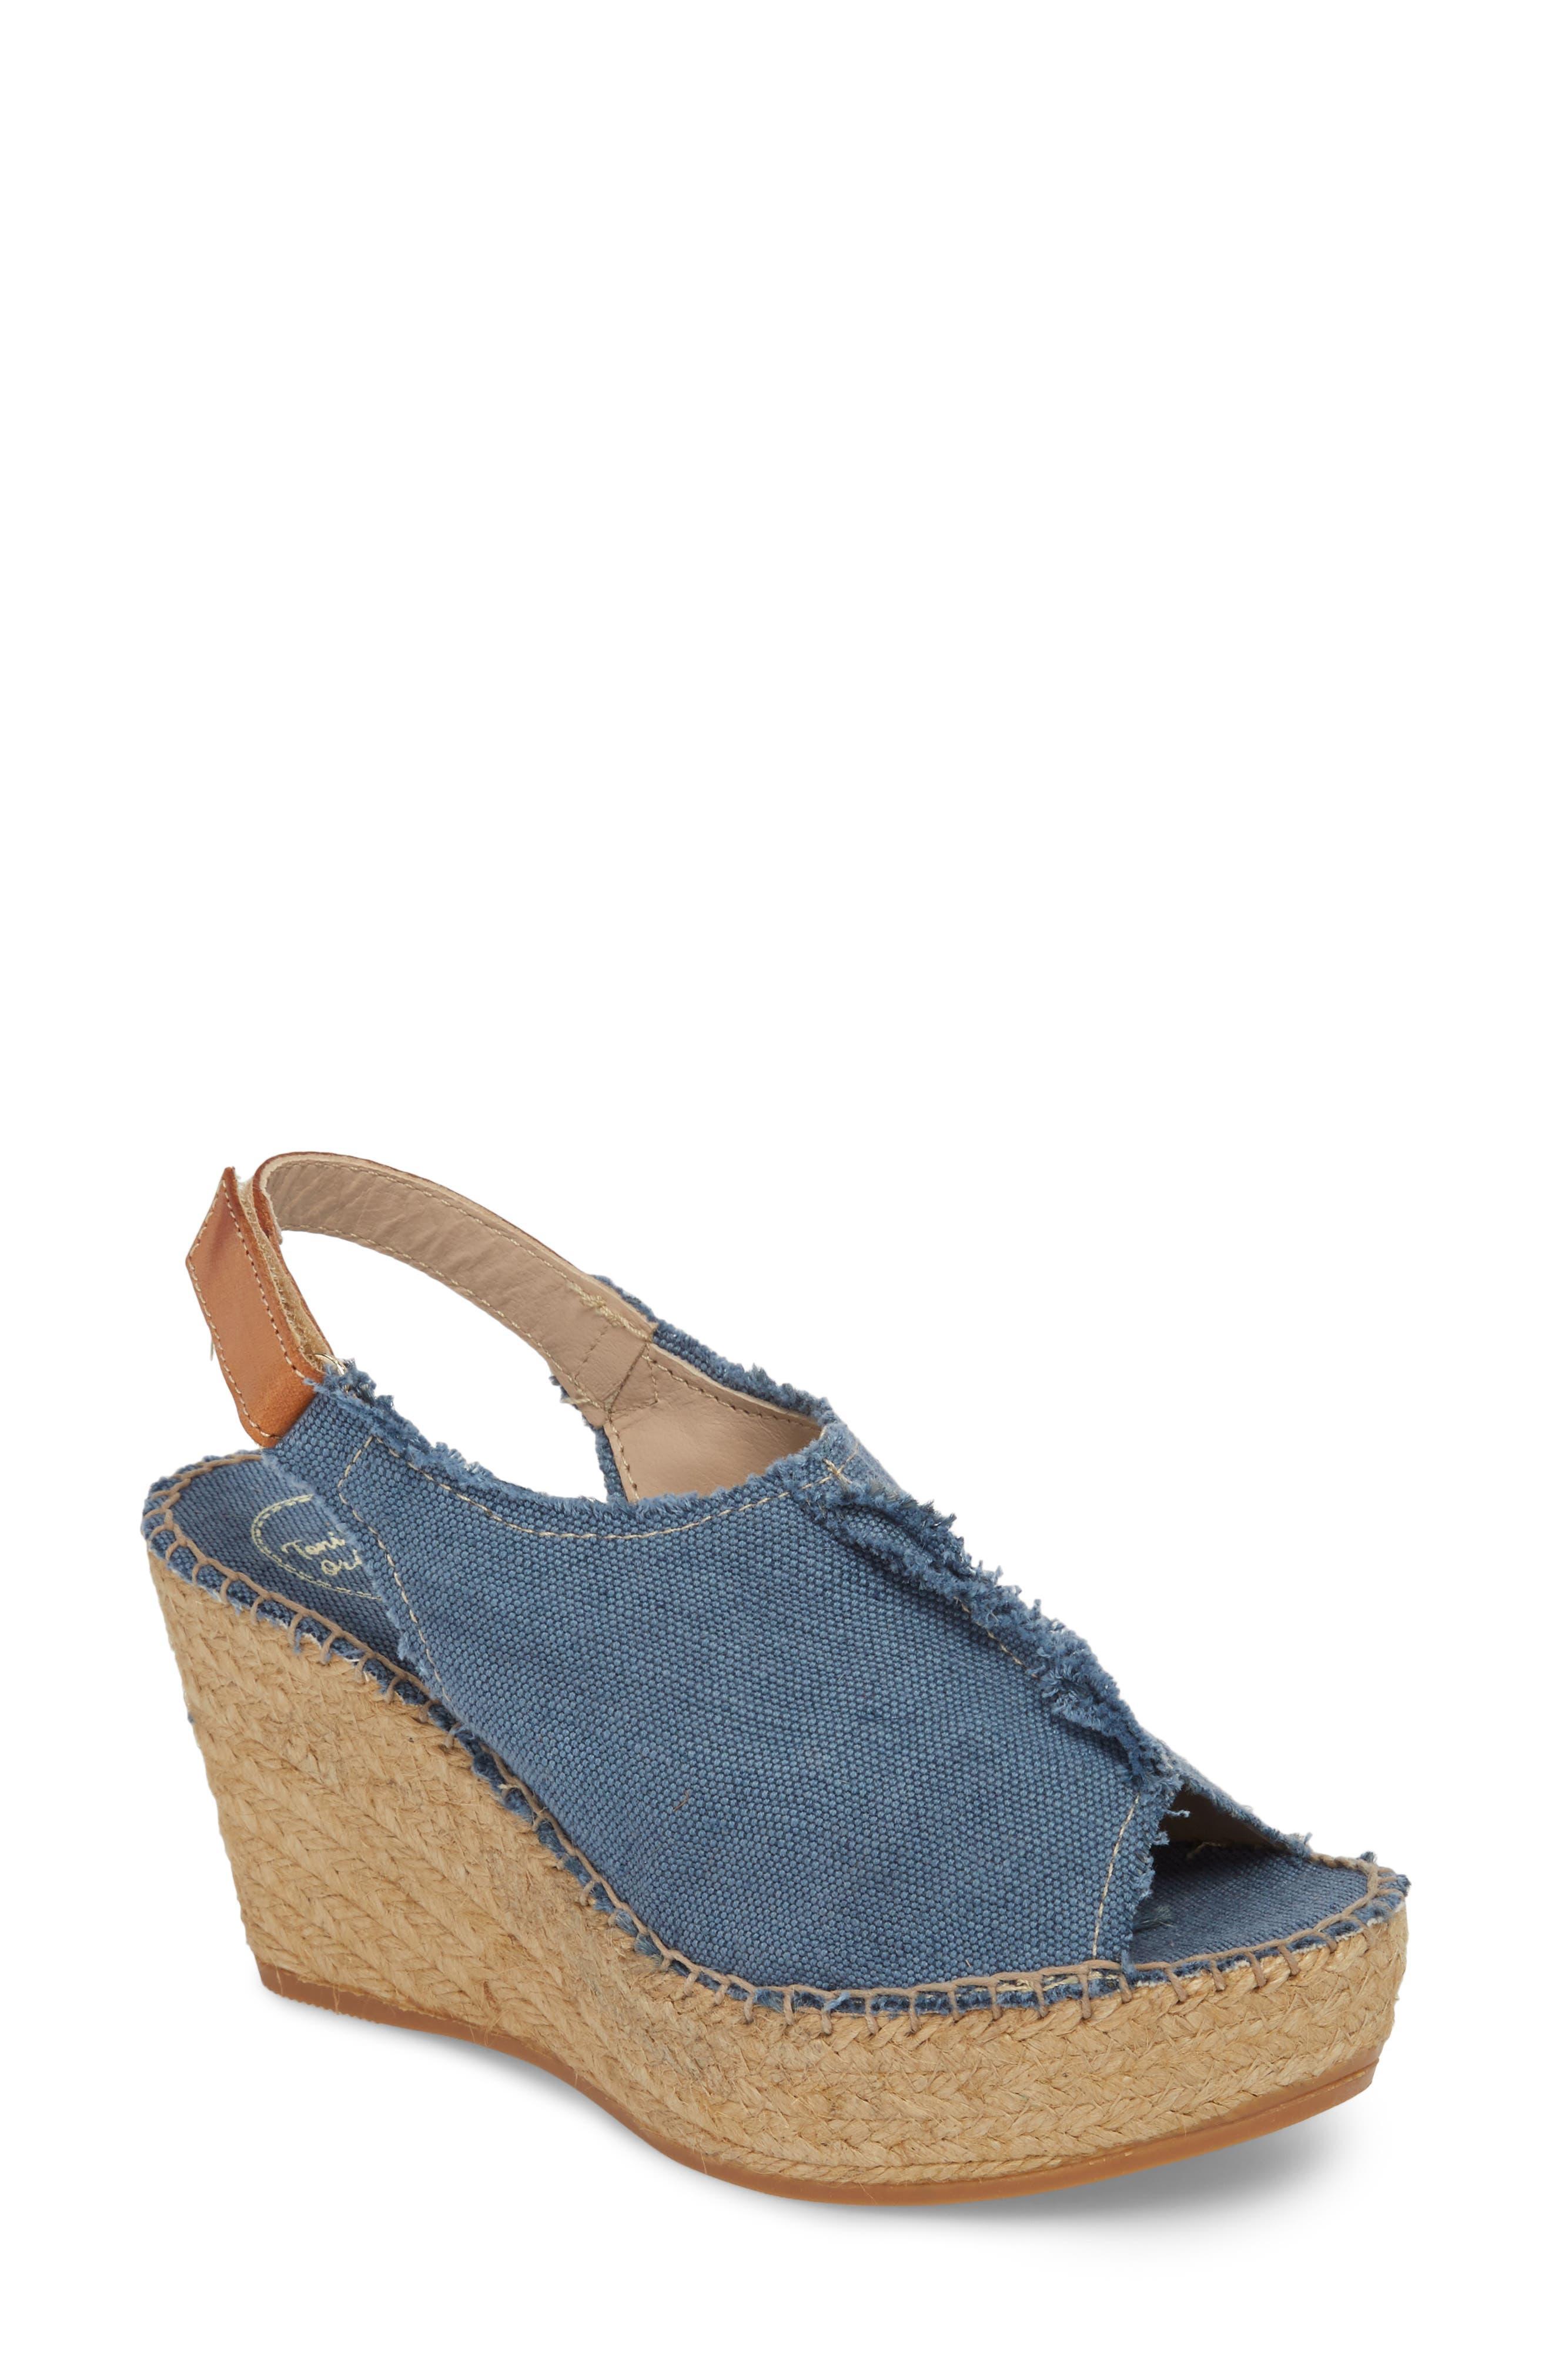 'Lugano' Espadrille Wedge Sandal,                         Main,                         color, Blue Fabric